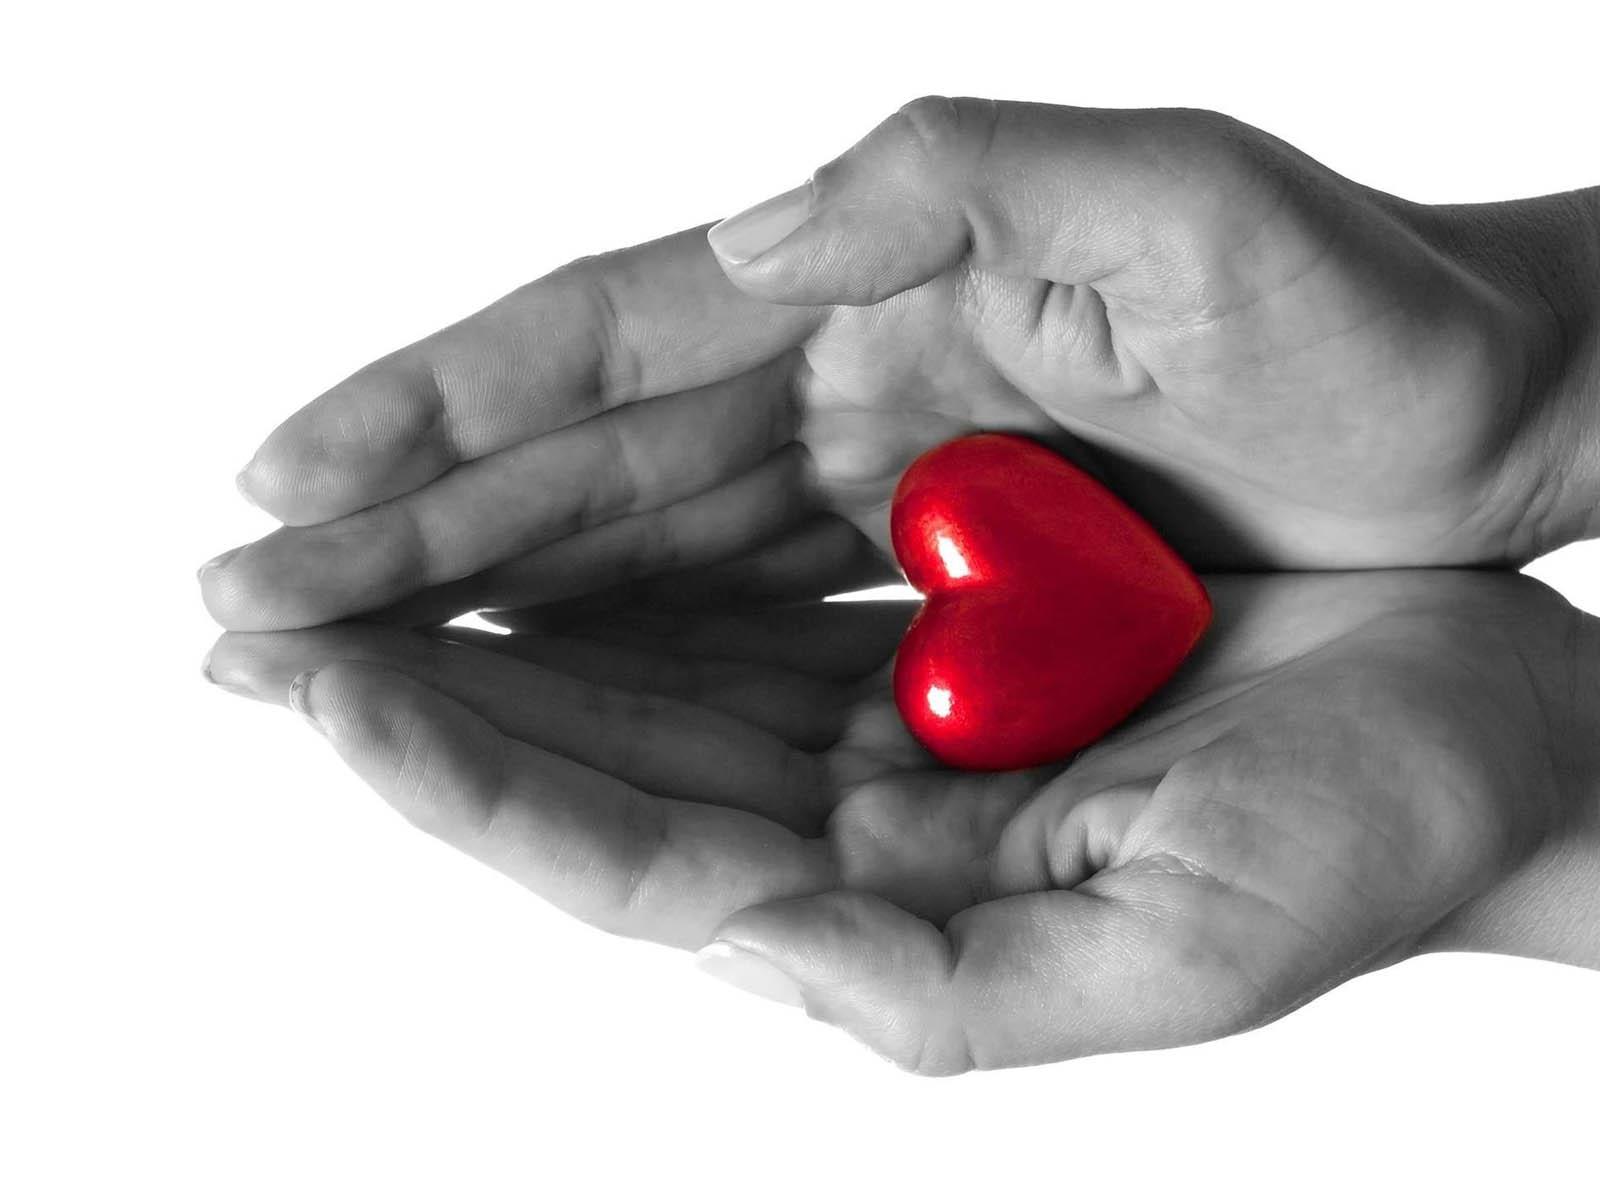 Gambar Tangan dengan Simbol Love cinta